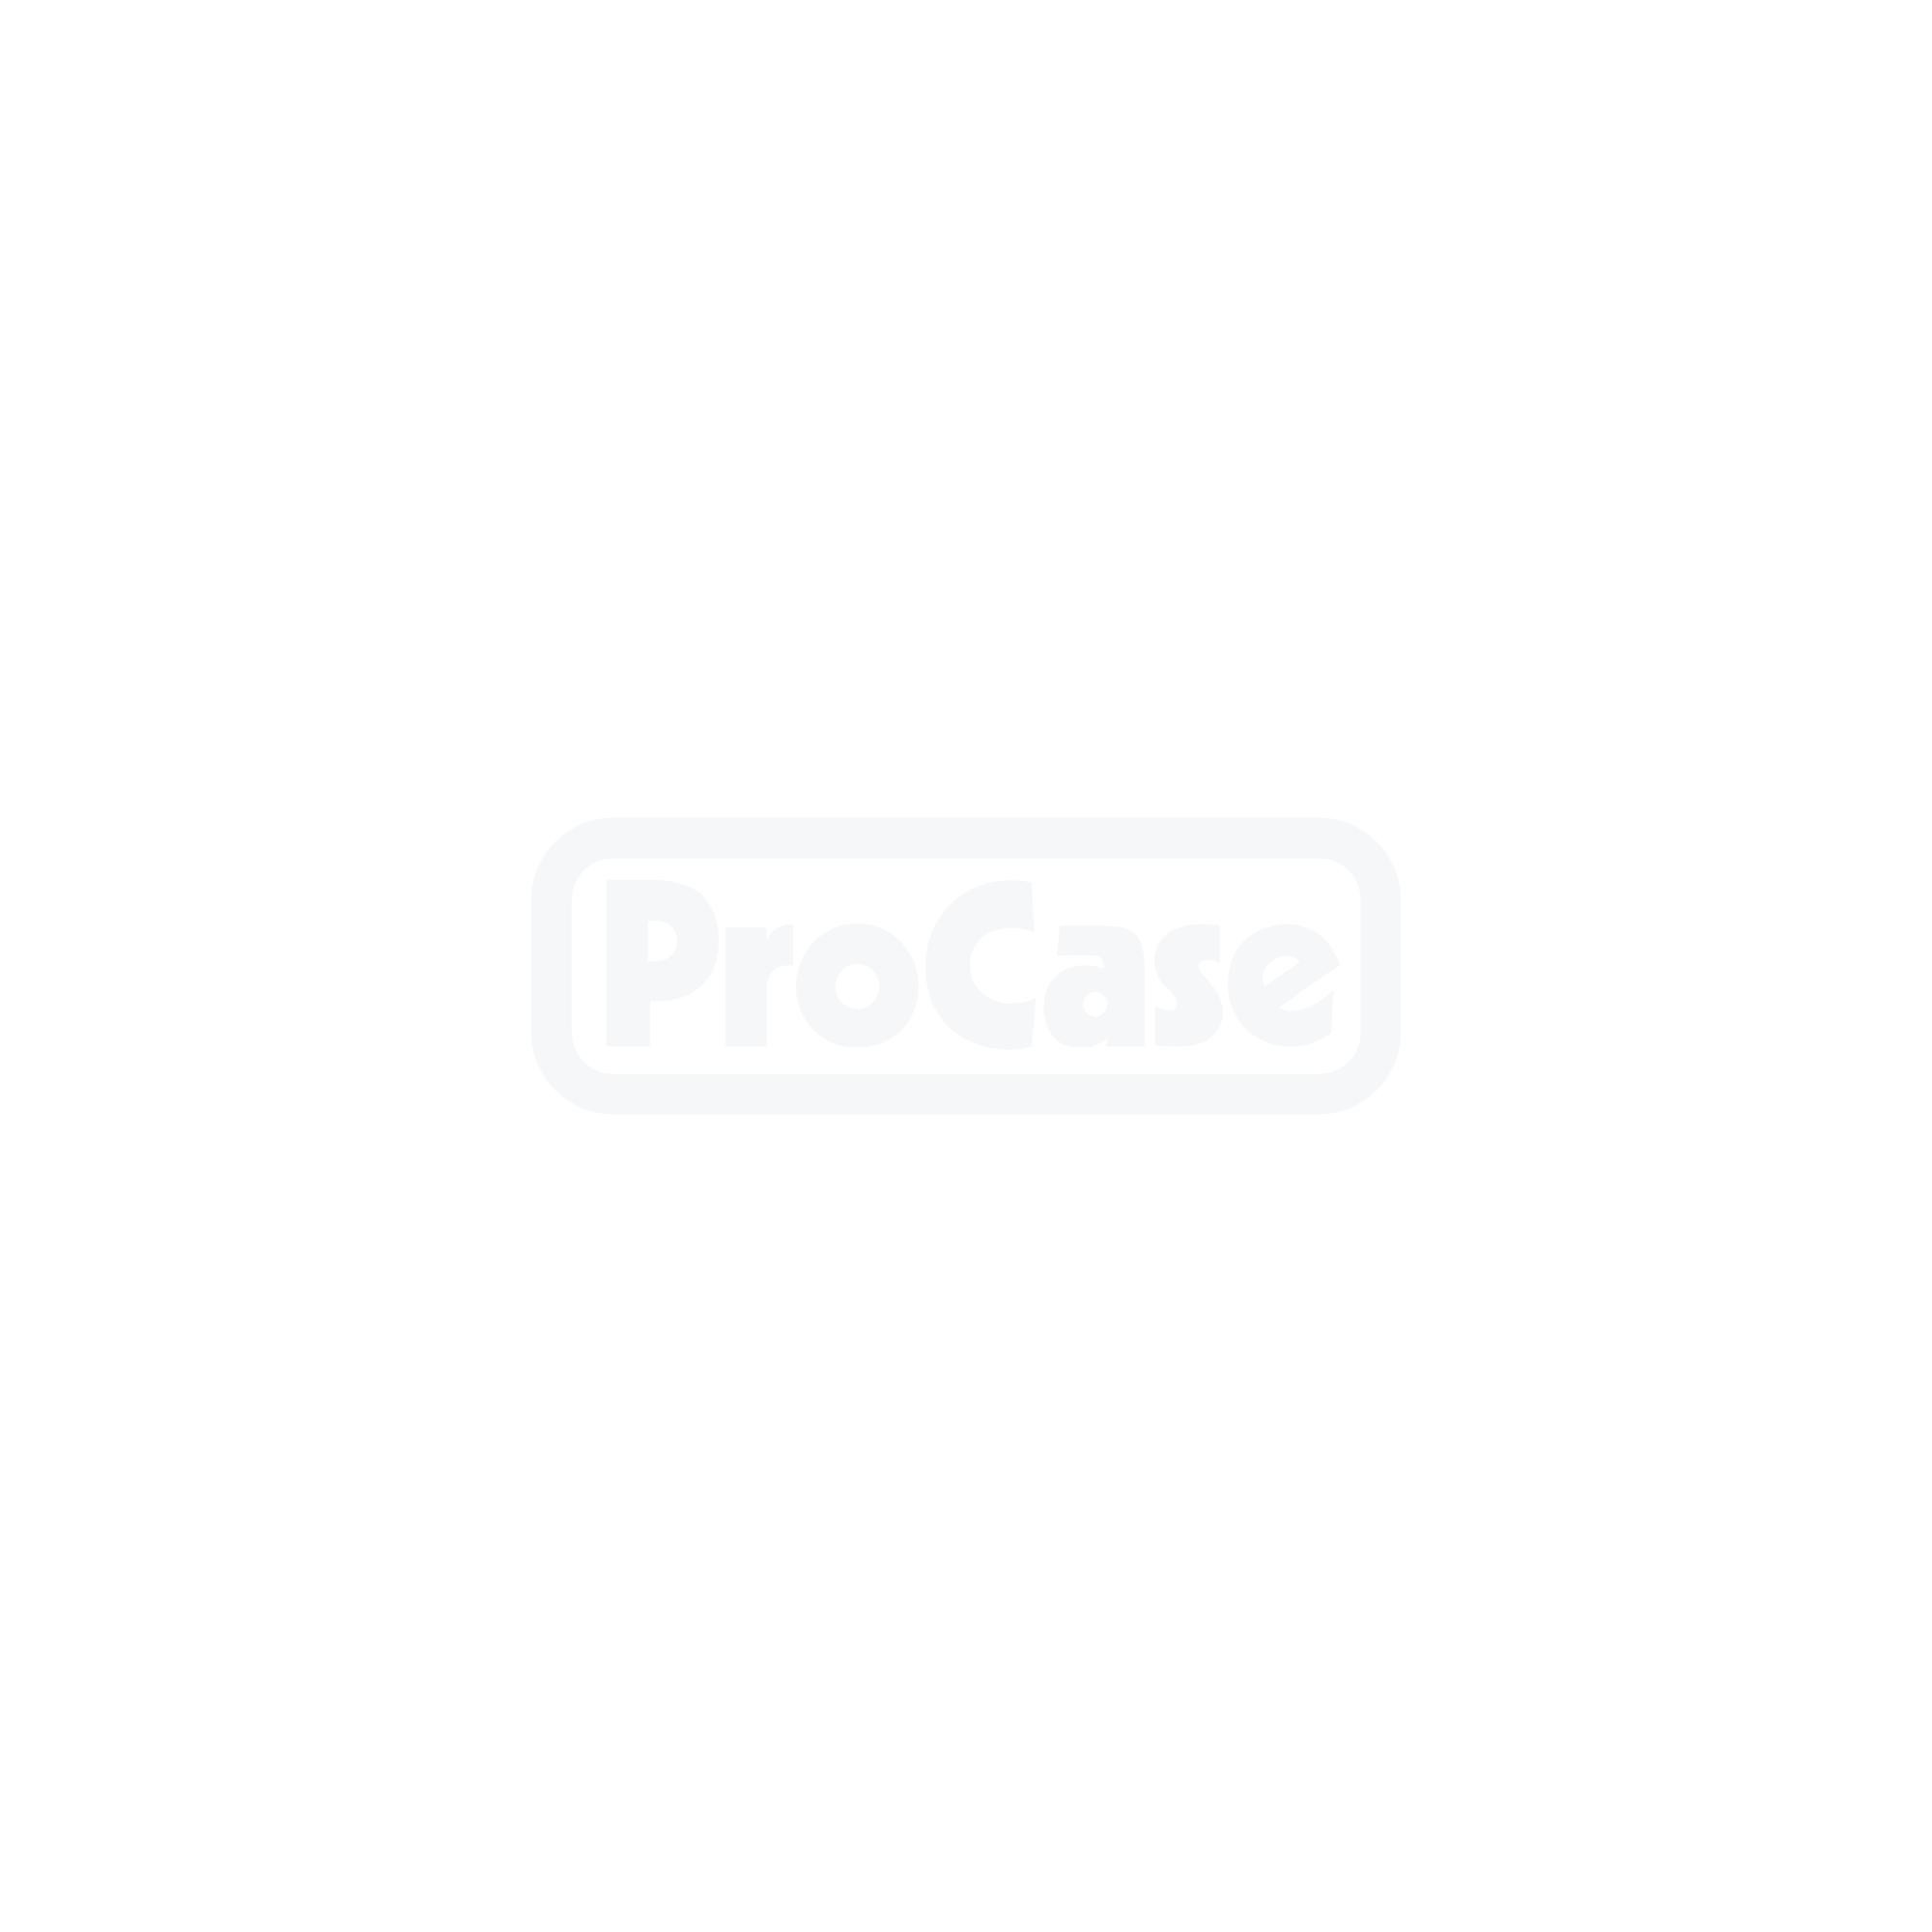 Flightcase für 4x JBLED A7 Zoom / JBLED A4 Zoom 4